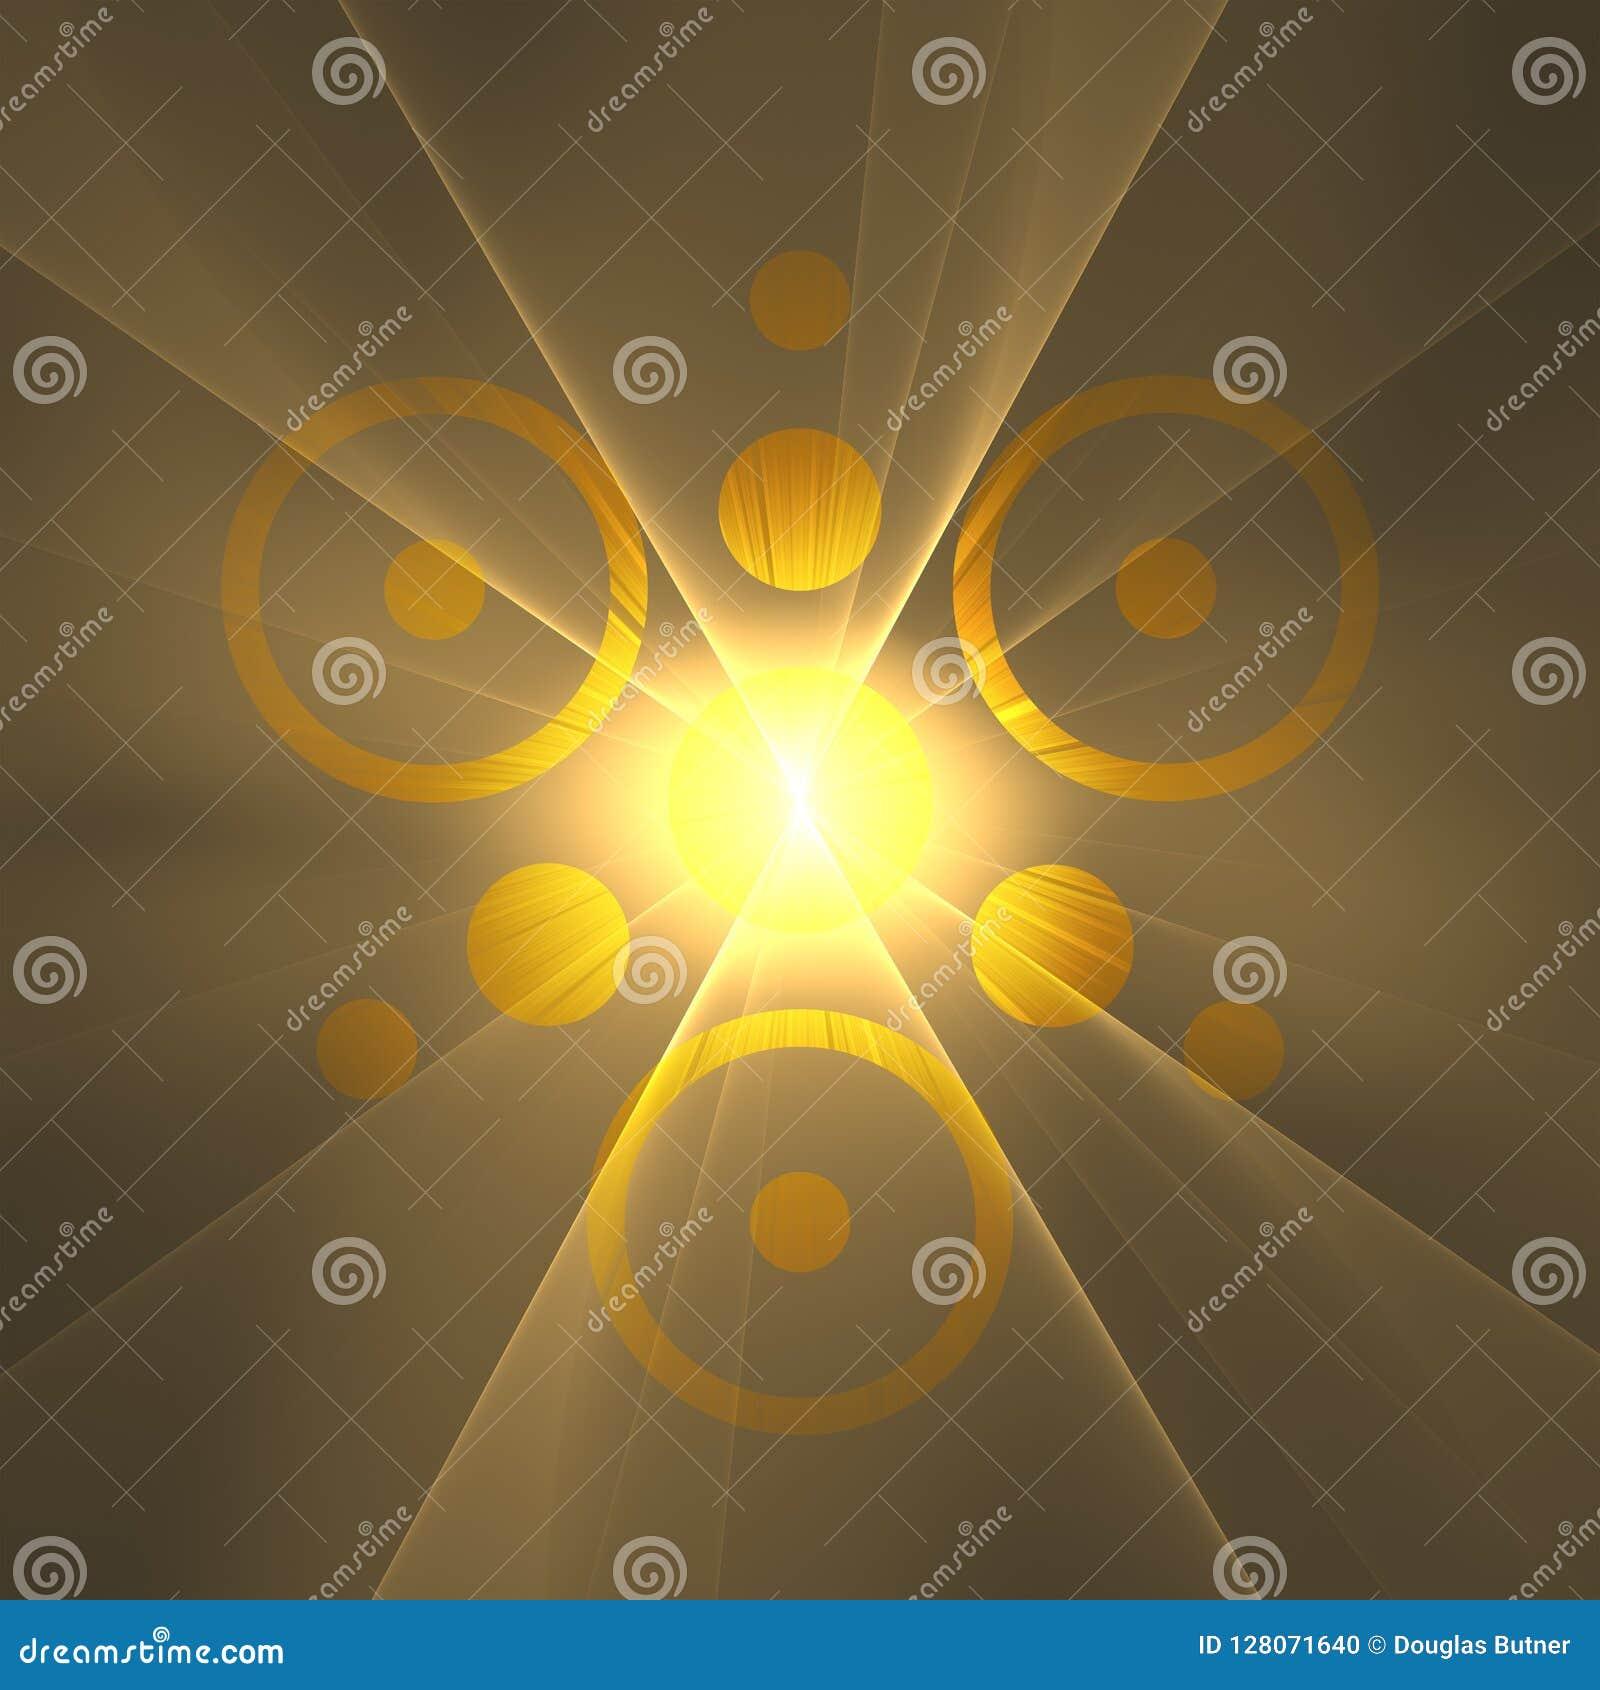 God Sol Explosion Of Love And Light Fractal Art Background